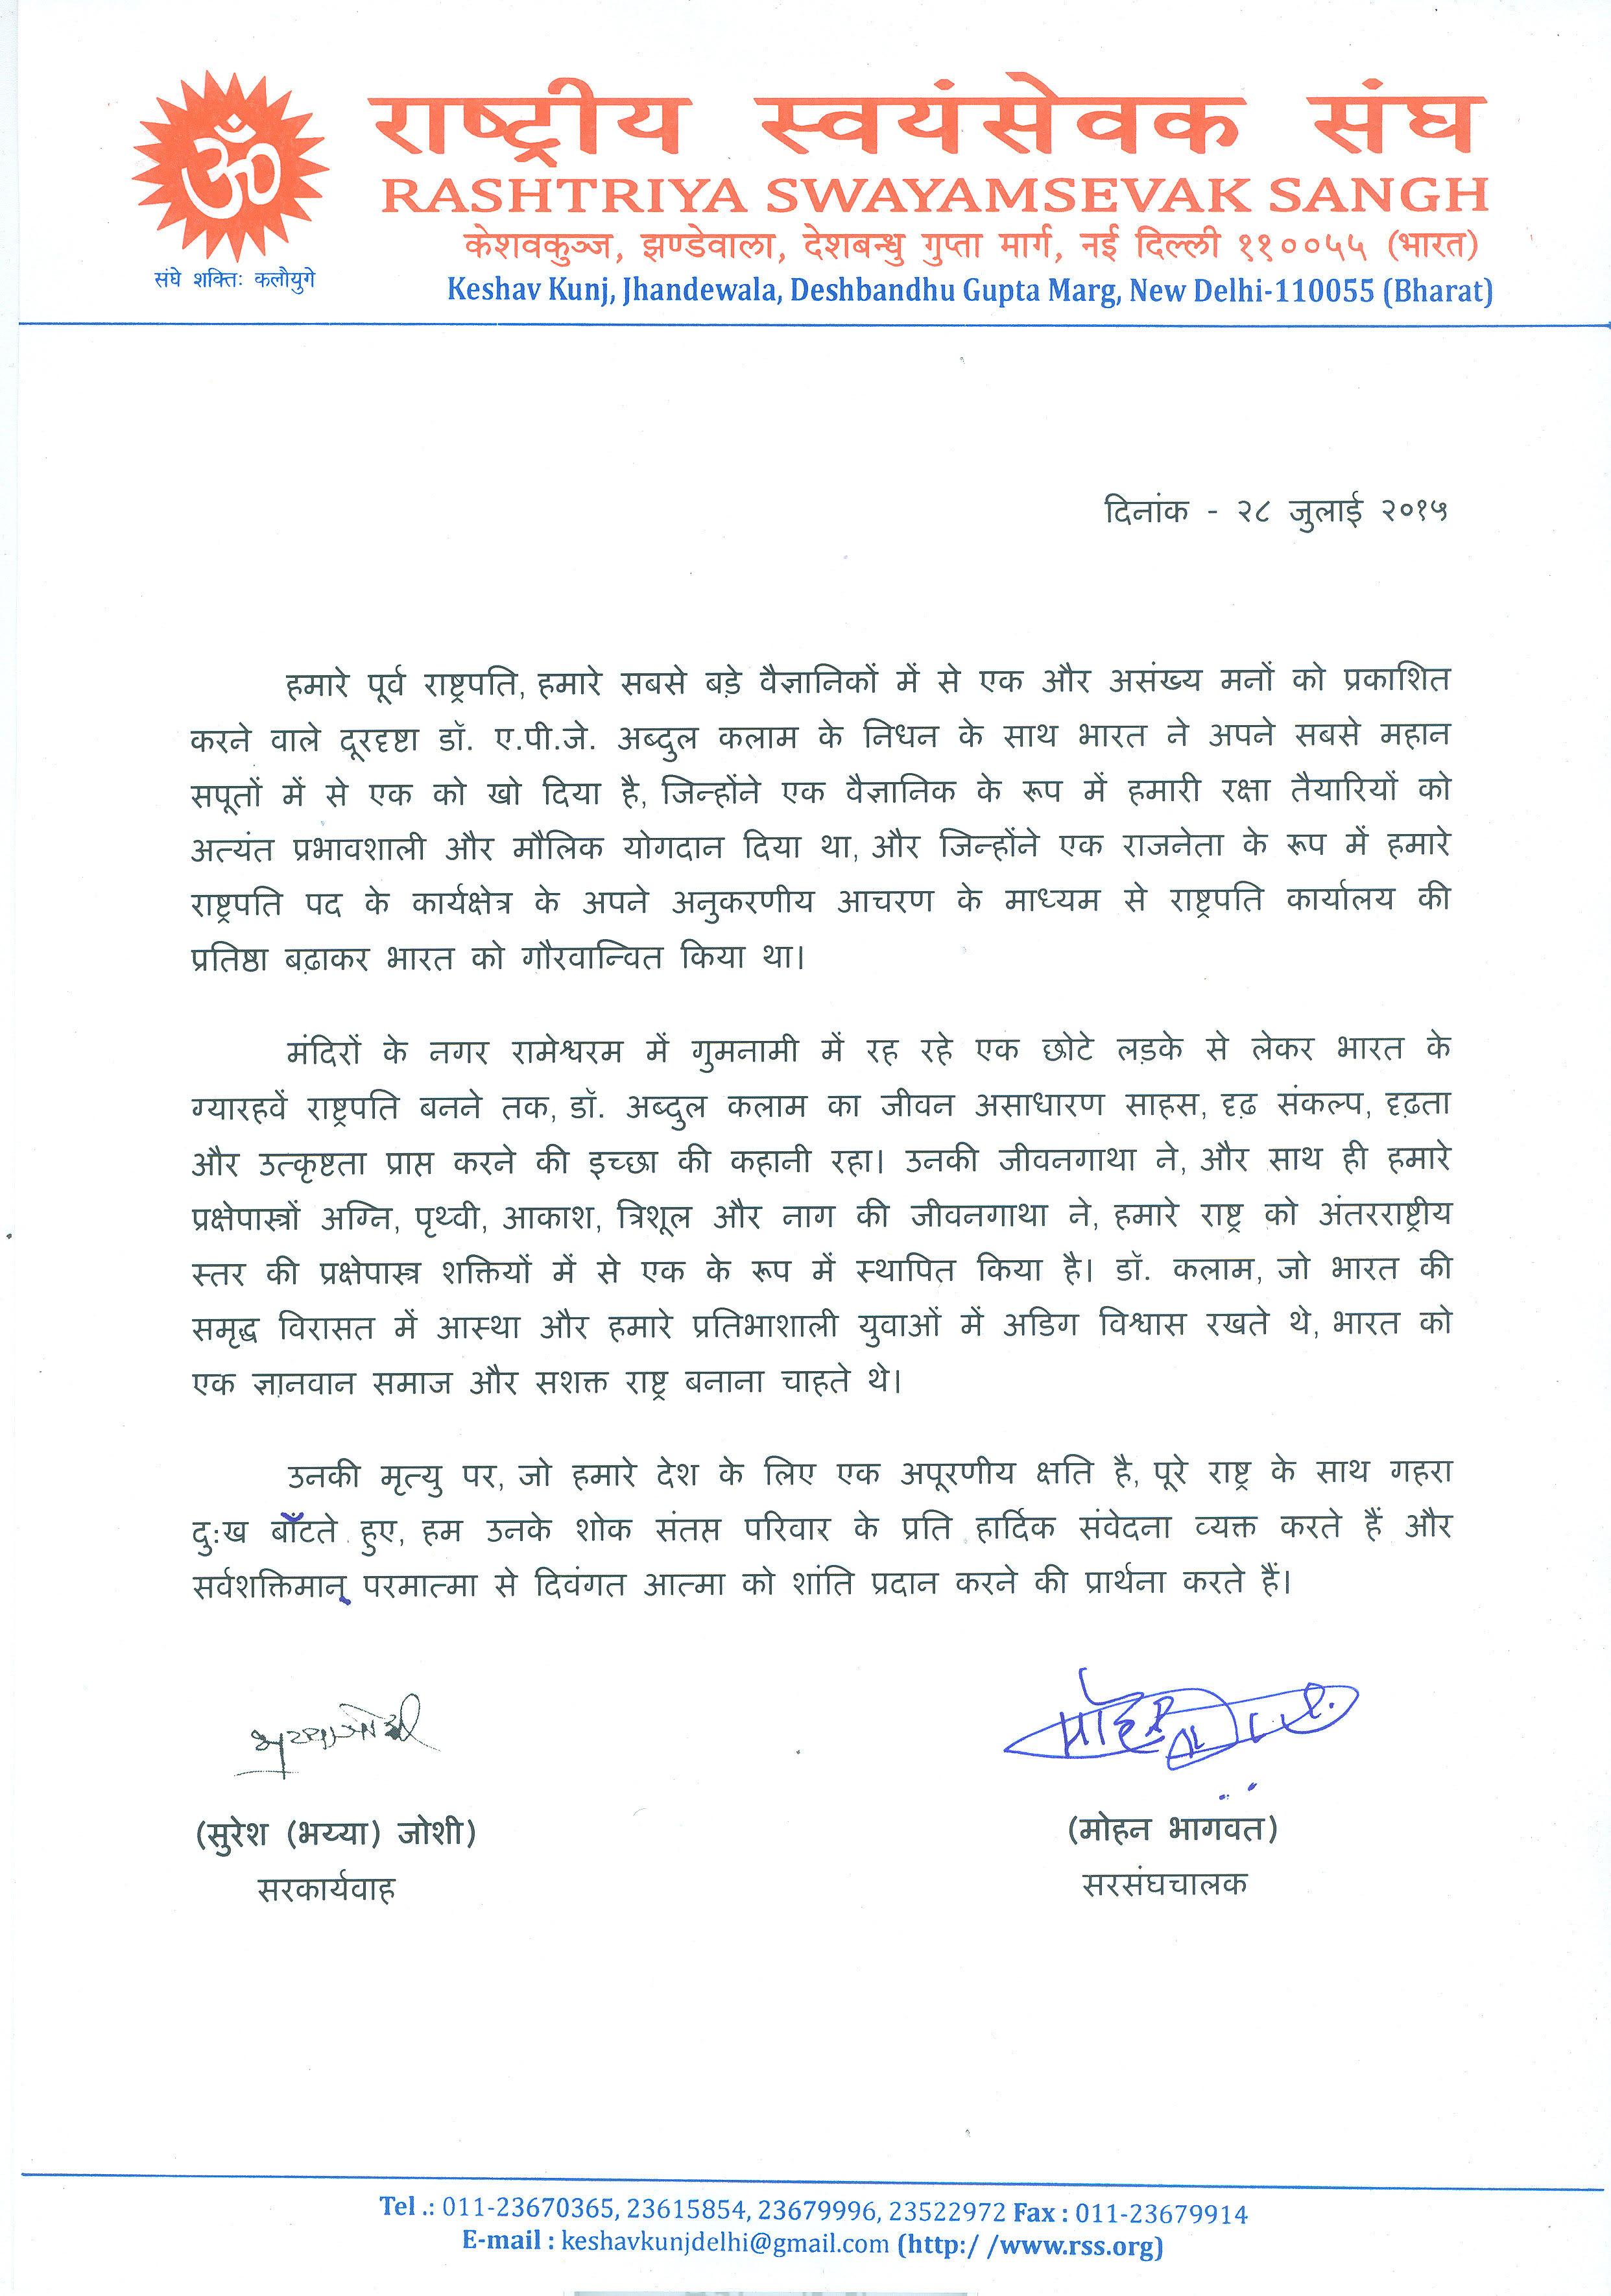 Sarasanghachalak Condolence on Kalam